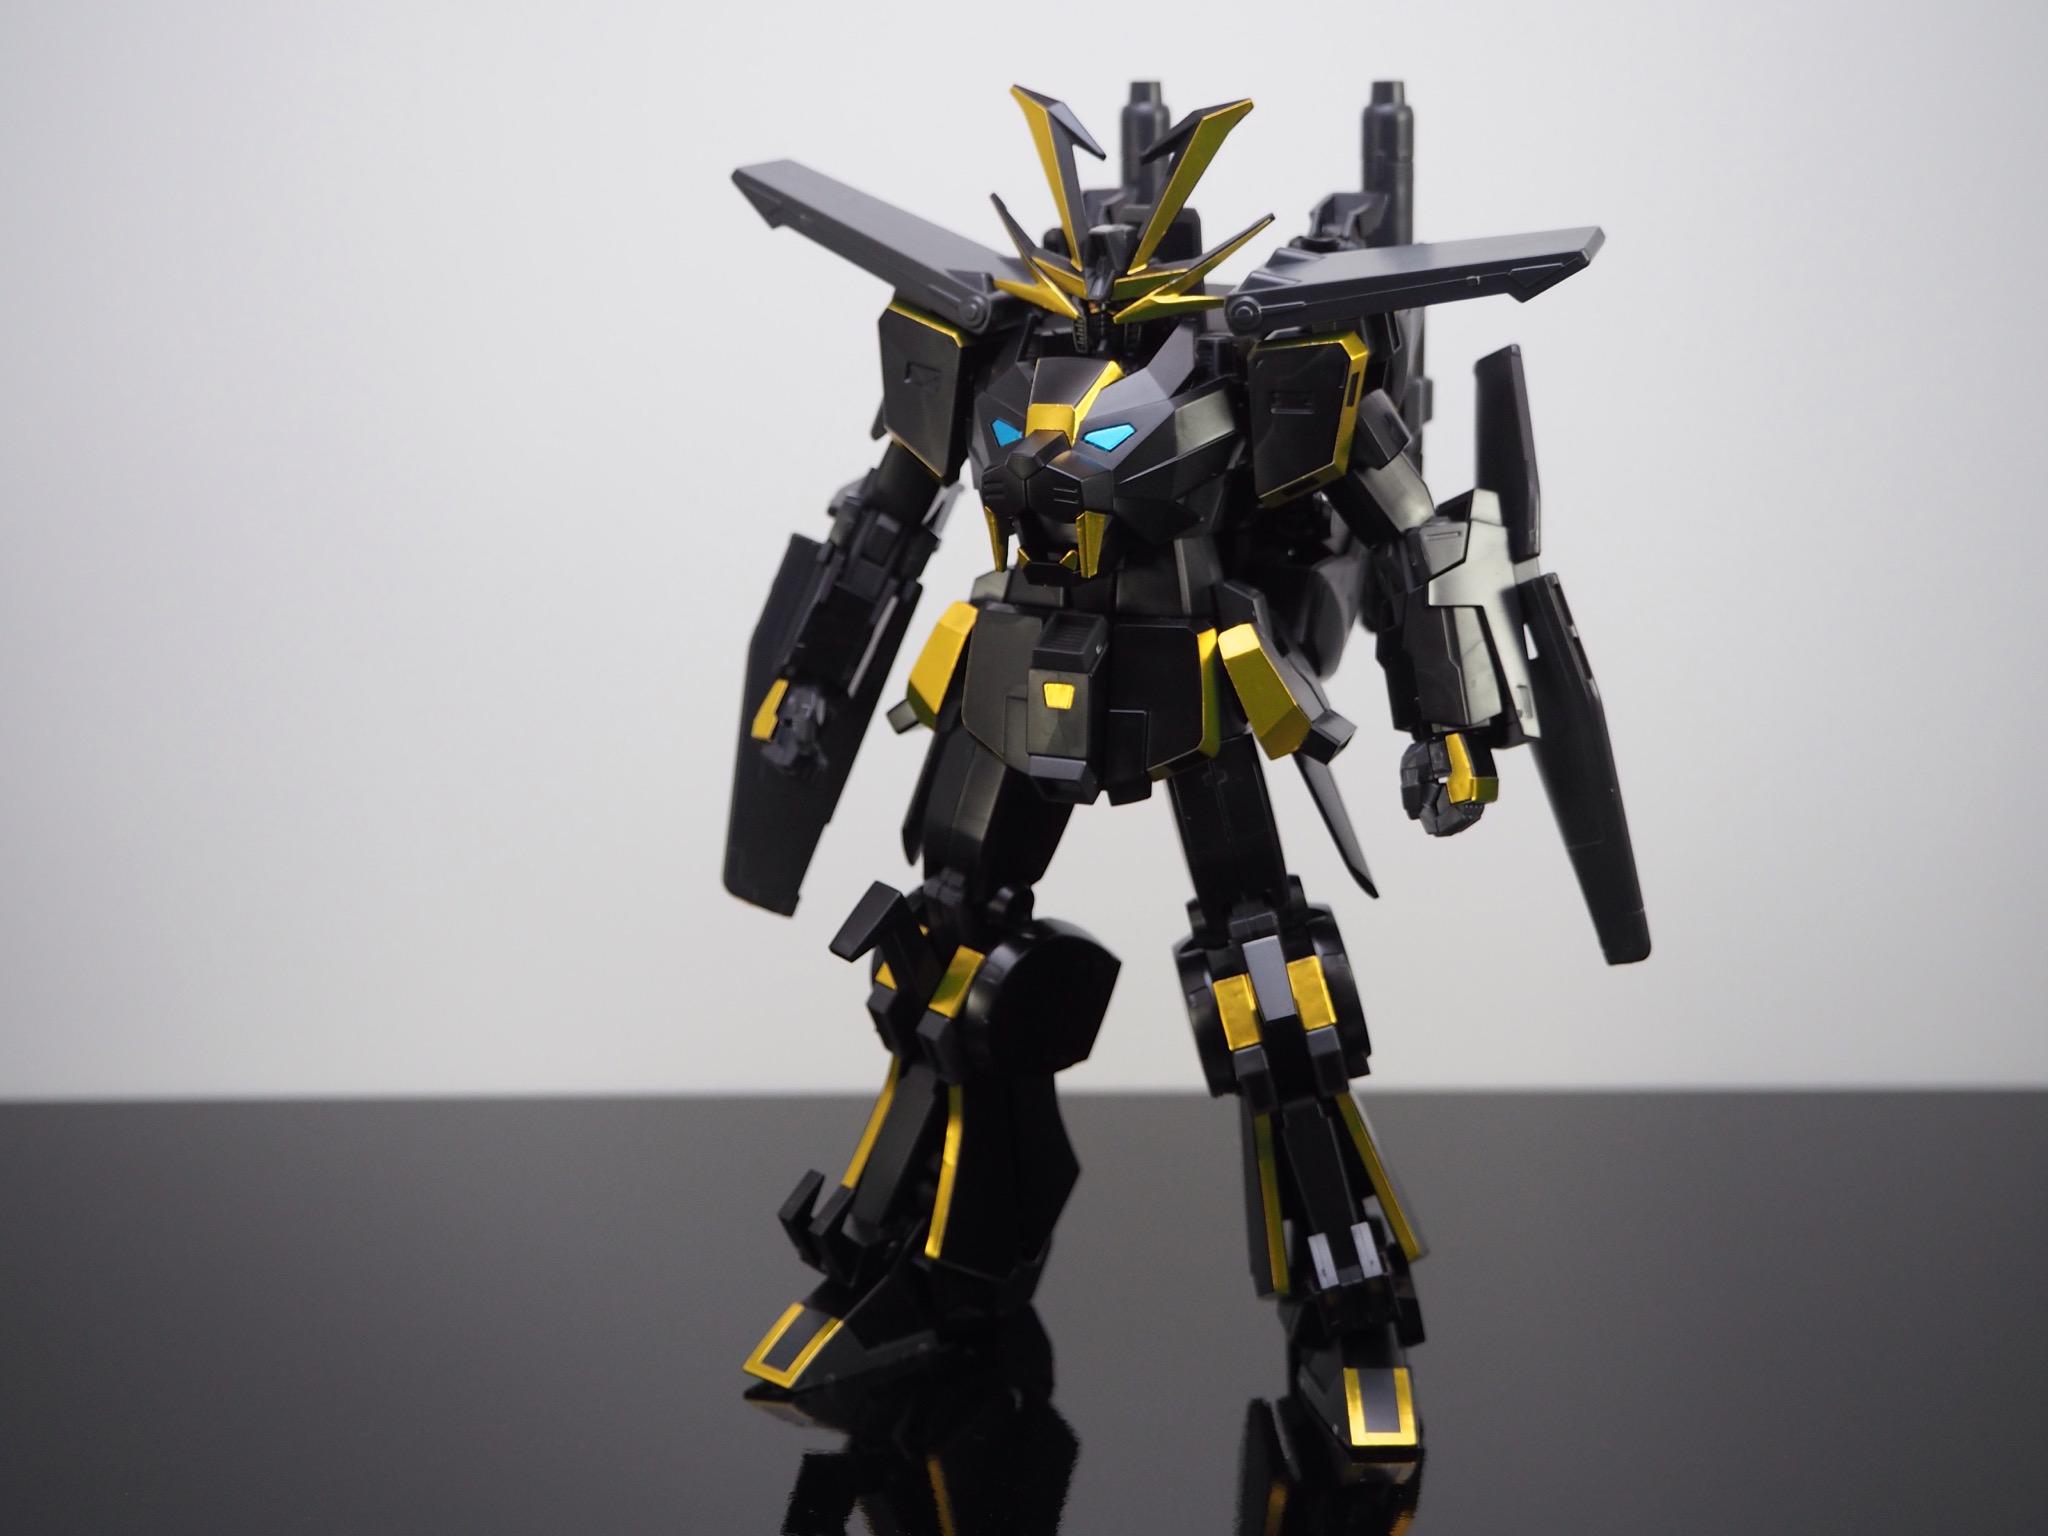 HGBF 1/144 煌黒機動 ガンダムドライオン3